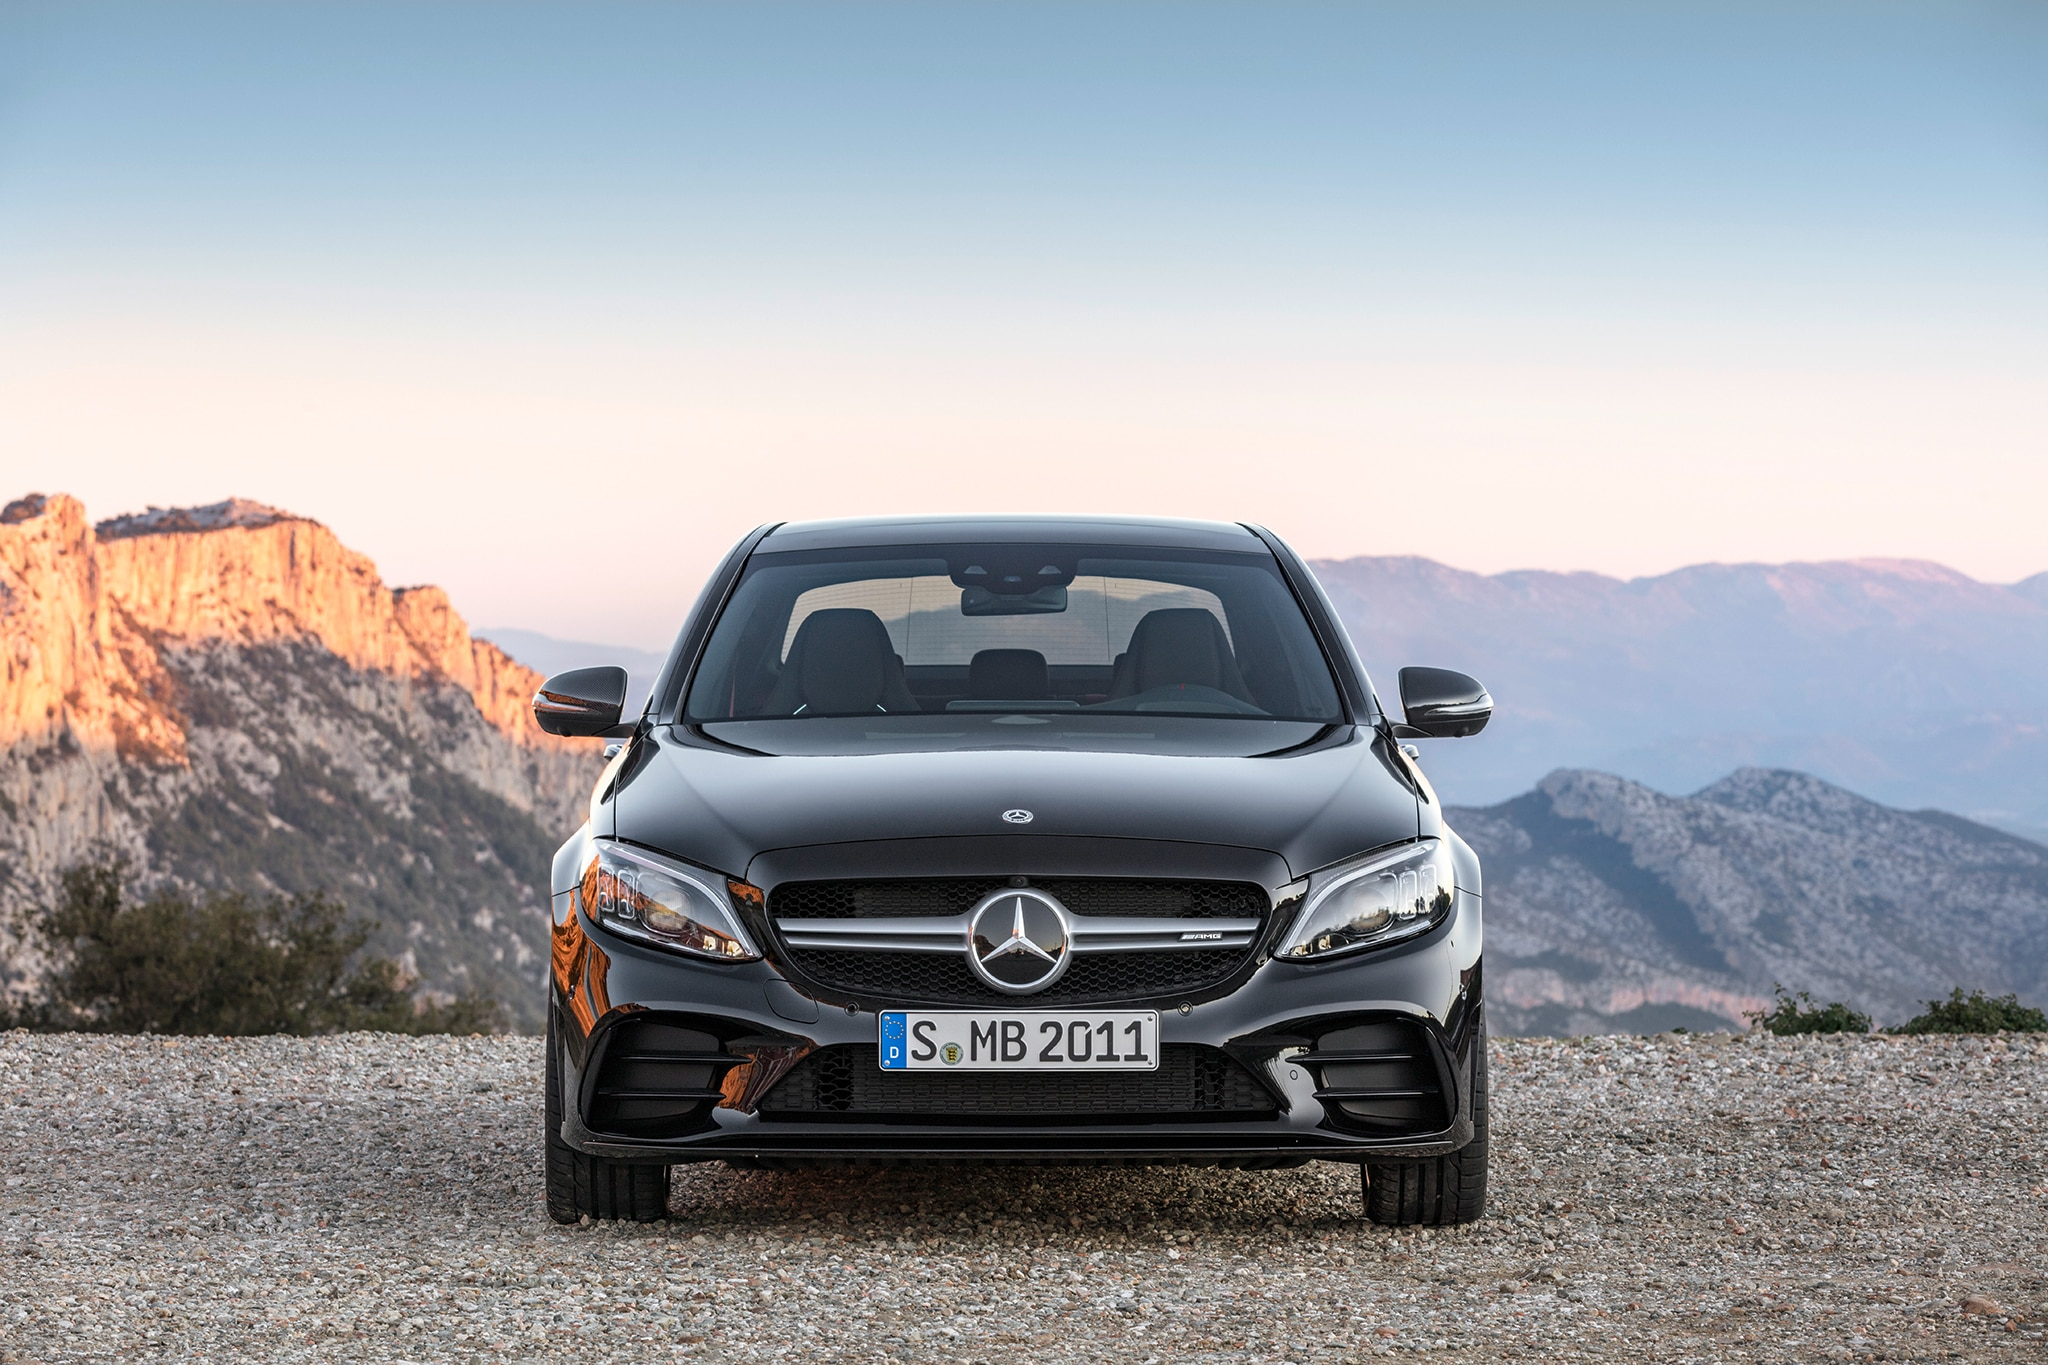 2019 mercedes amg c43 sedan debuts in geneva automobile. Black Bedroom Furniture Sets. Home Design Ideas